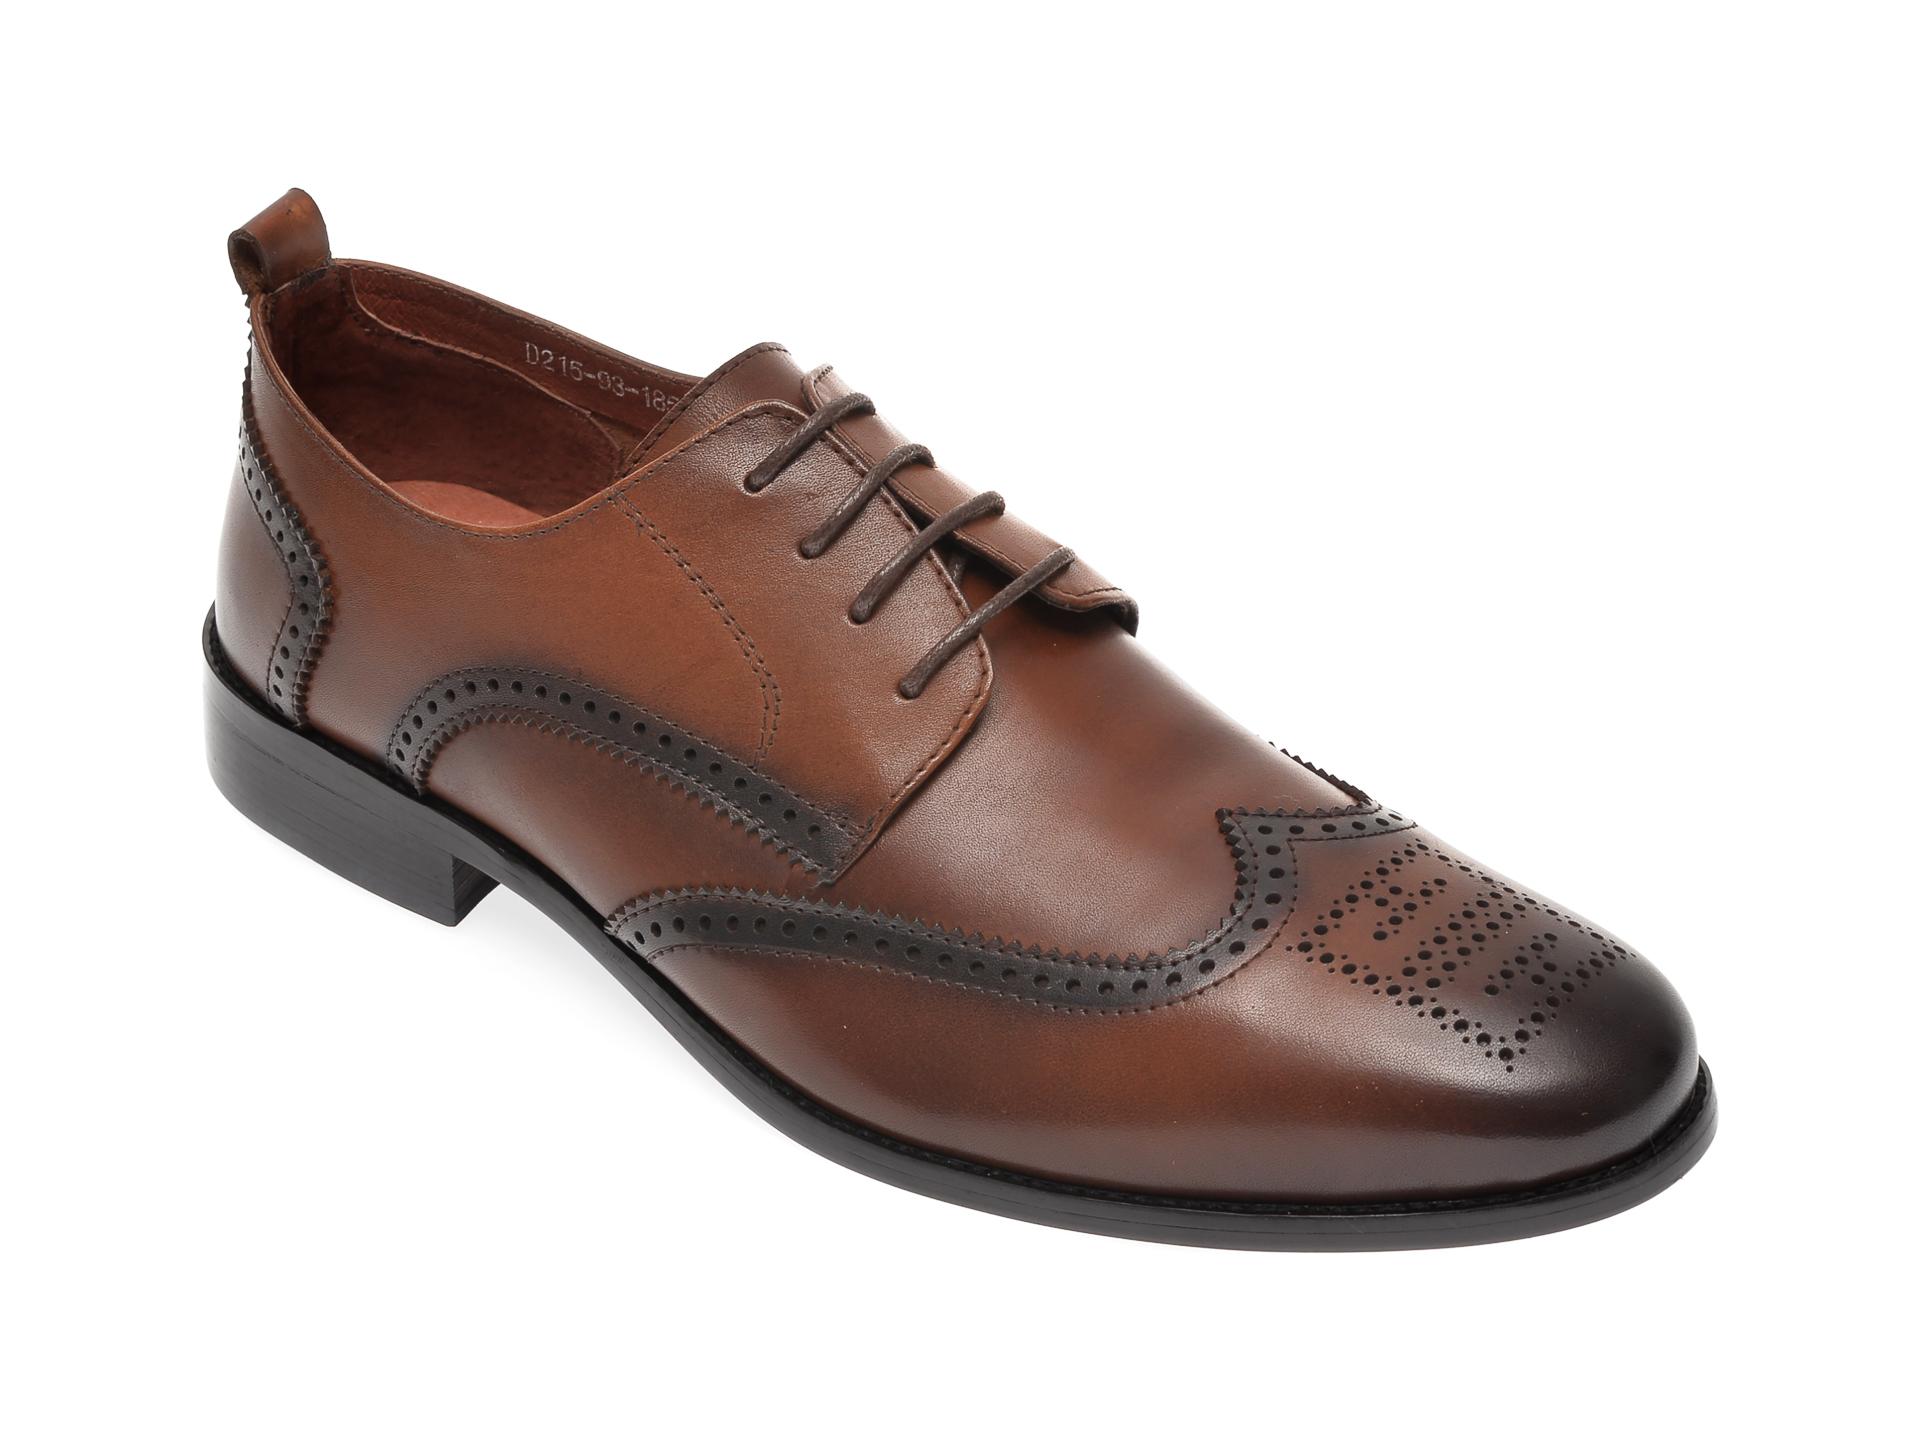 Pantofi OTTER maro, D21593, din piele naturala imagine